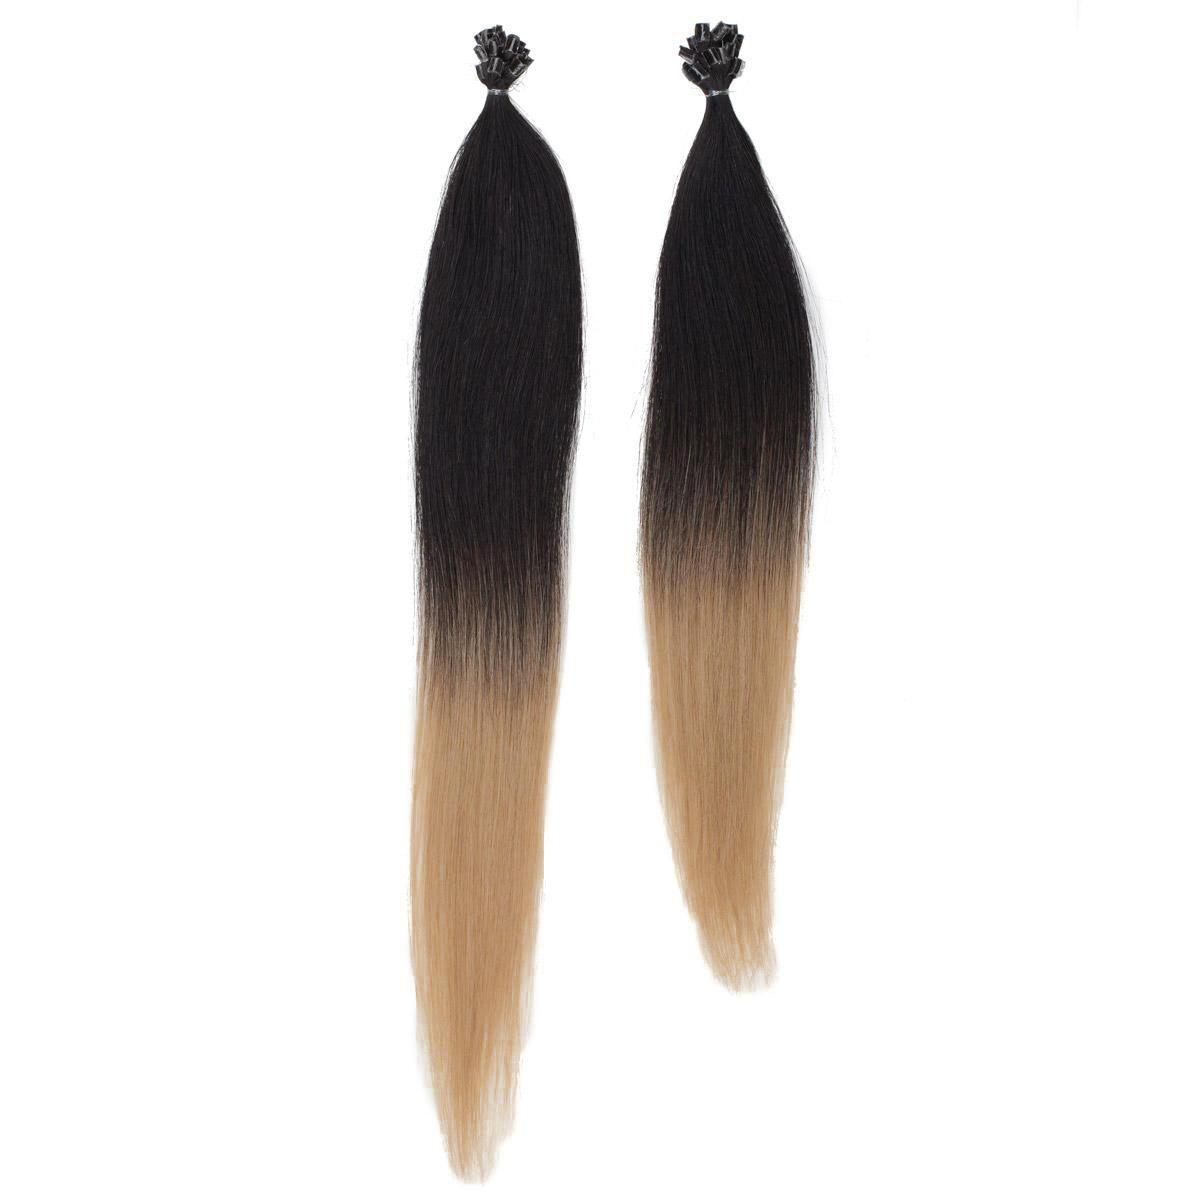 Nail Hair O1.2/7.5 Black Blond Ombre 40 cm